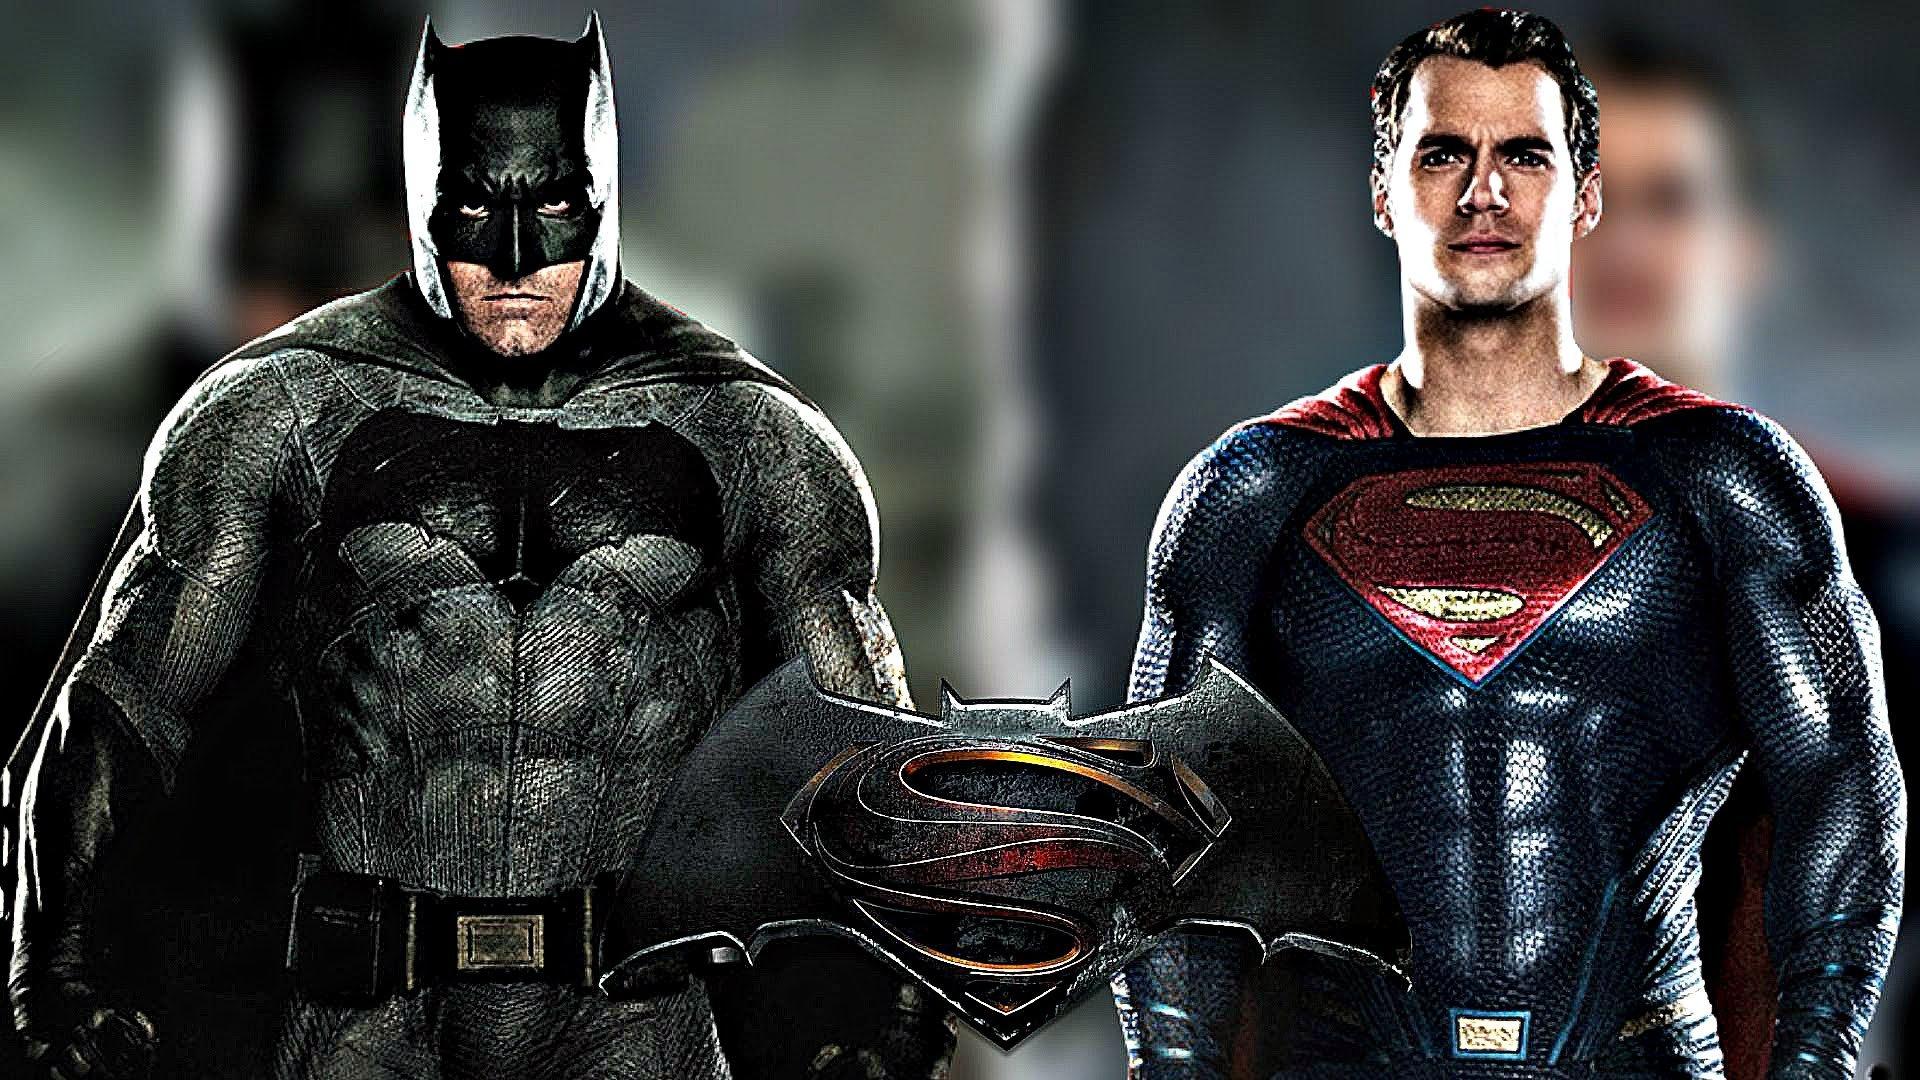 Batman And Superman Wallpaper Background HD Download Wallpapers 1920x1080